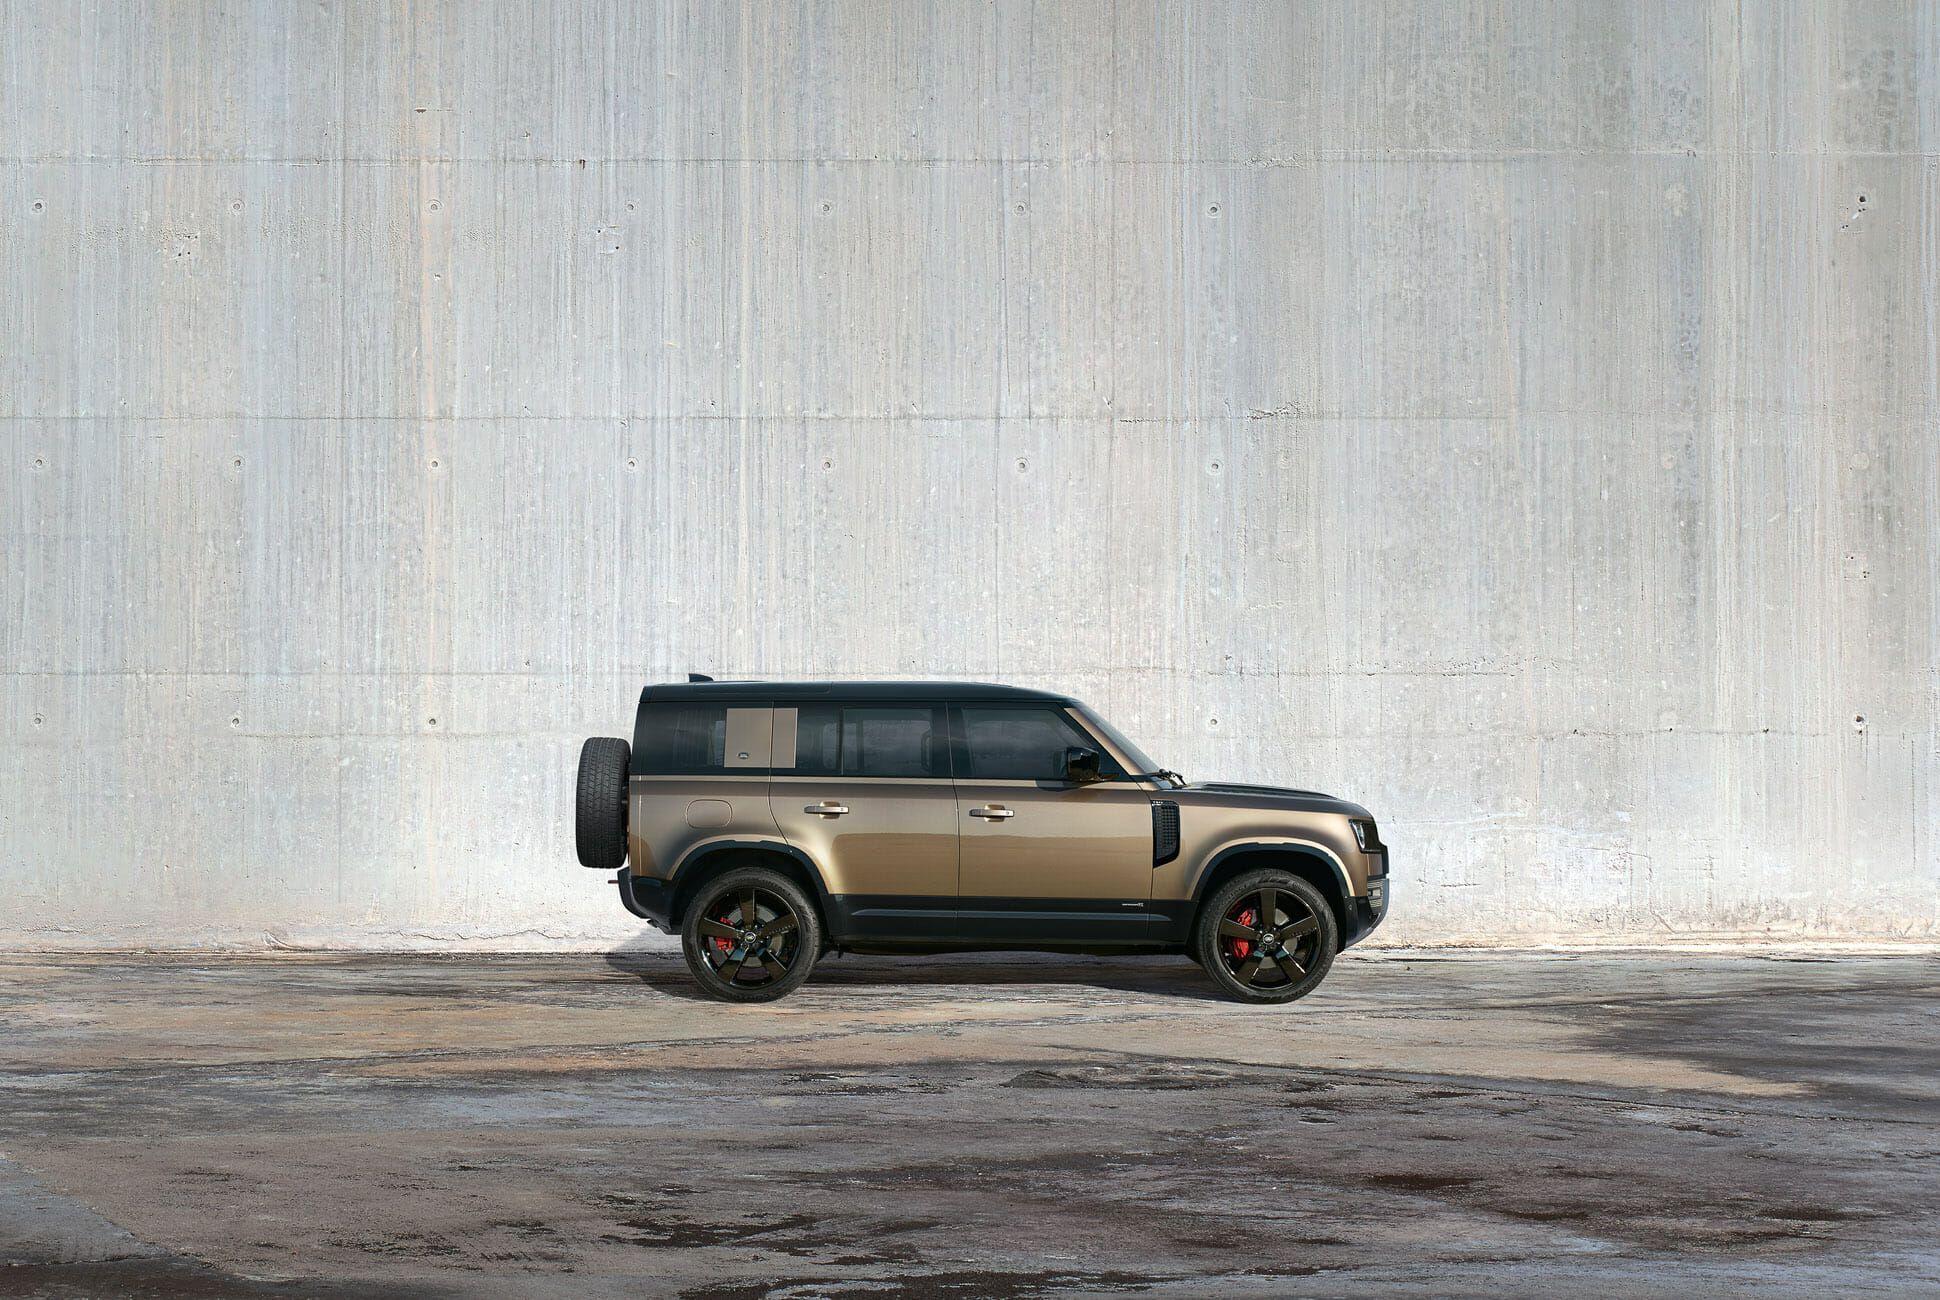 Land Rover Defender Gear Patrol-Exterior Static-Slide-05